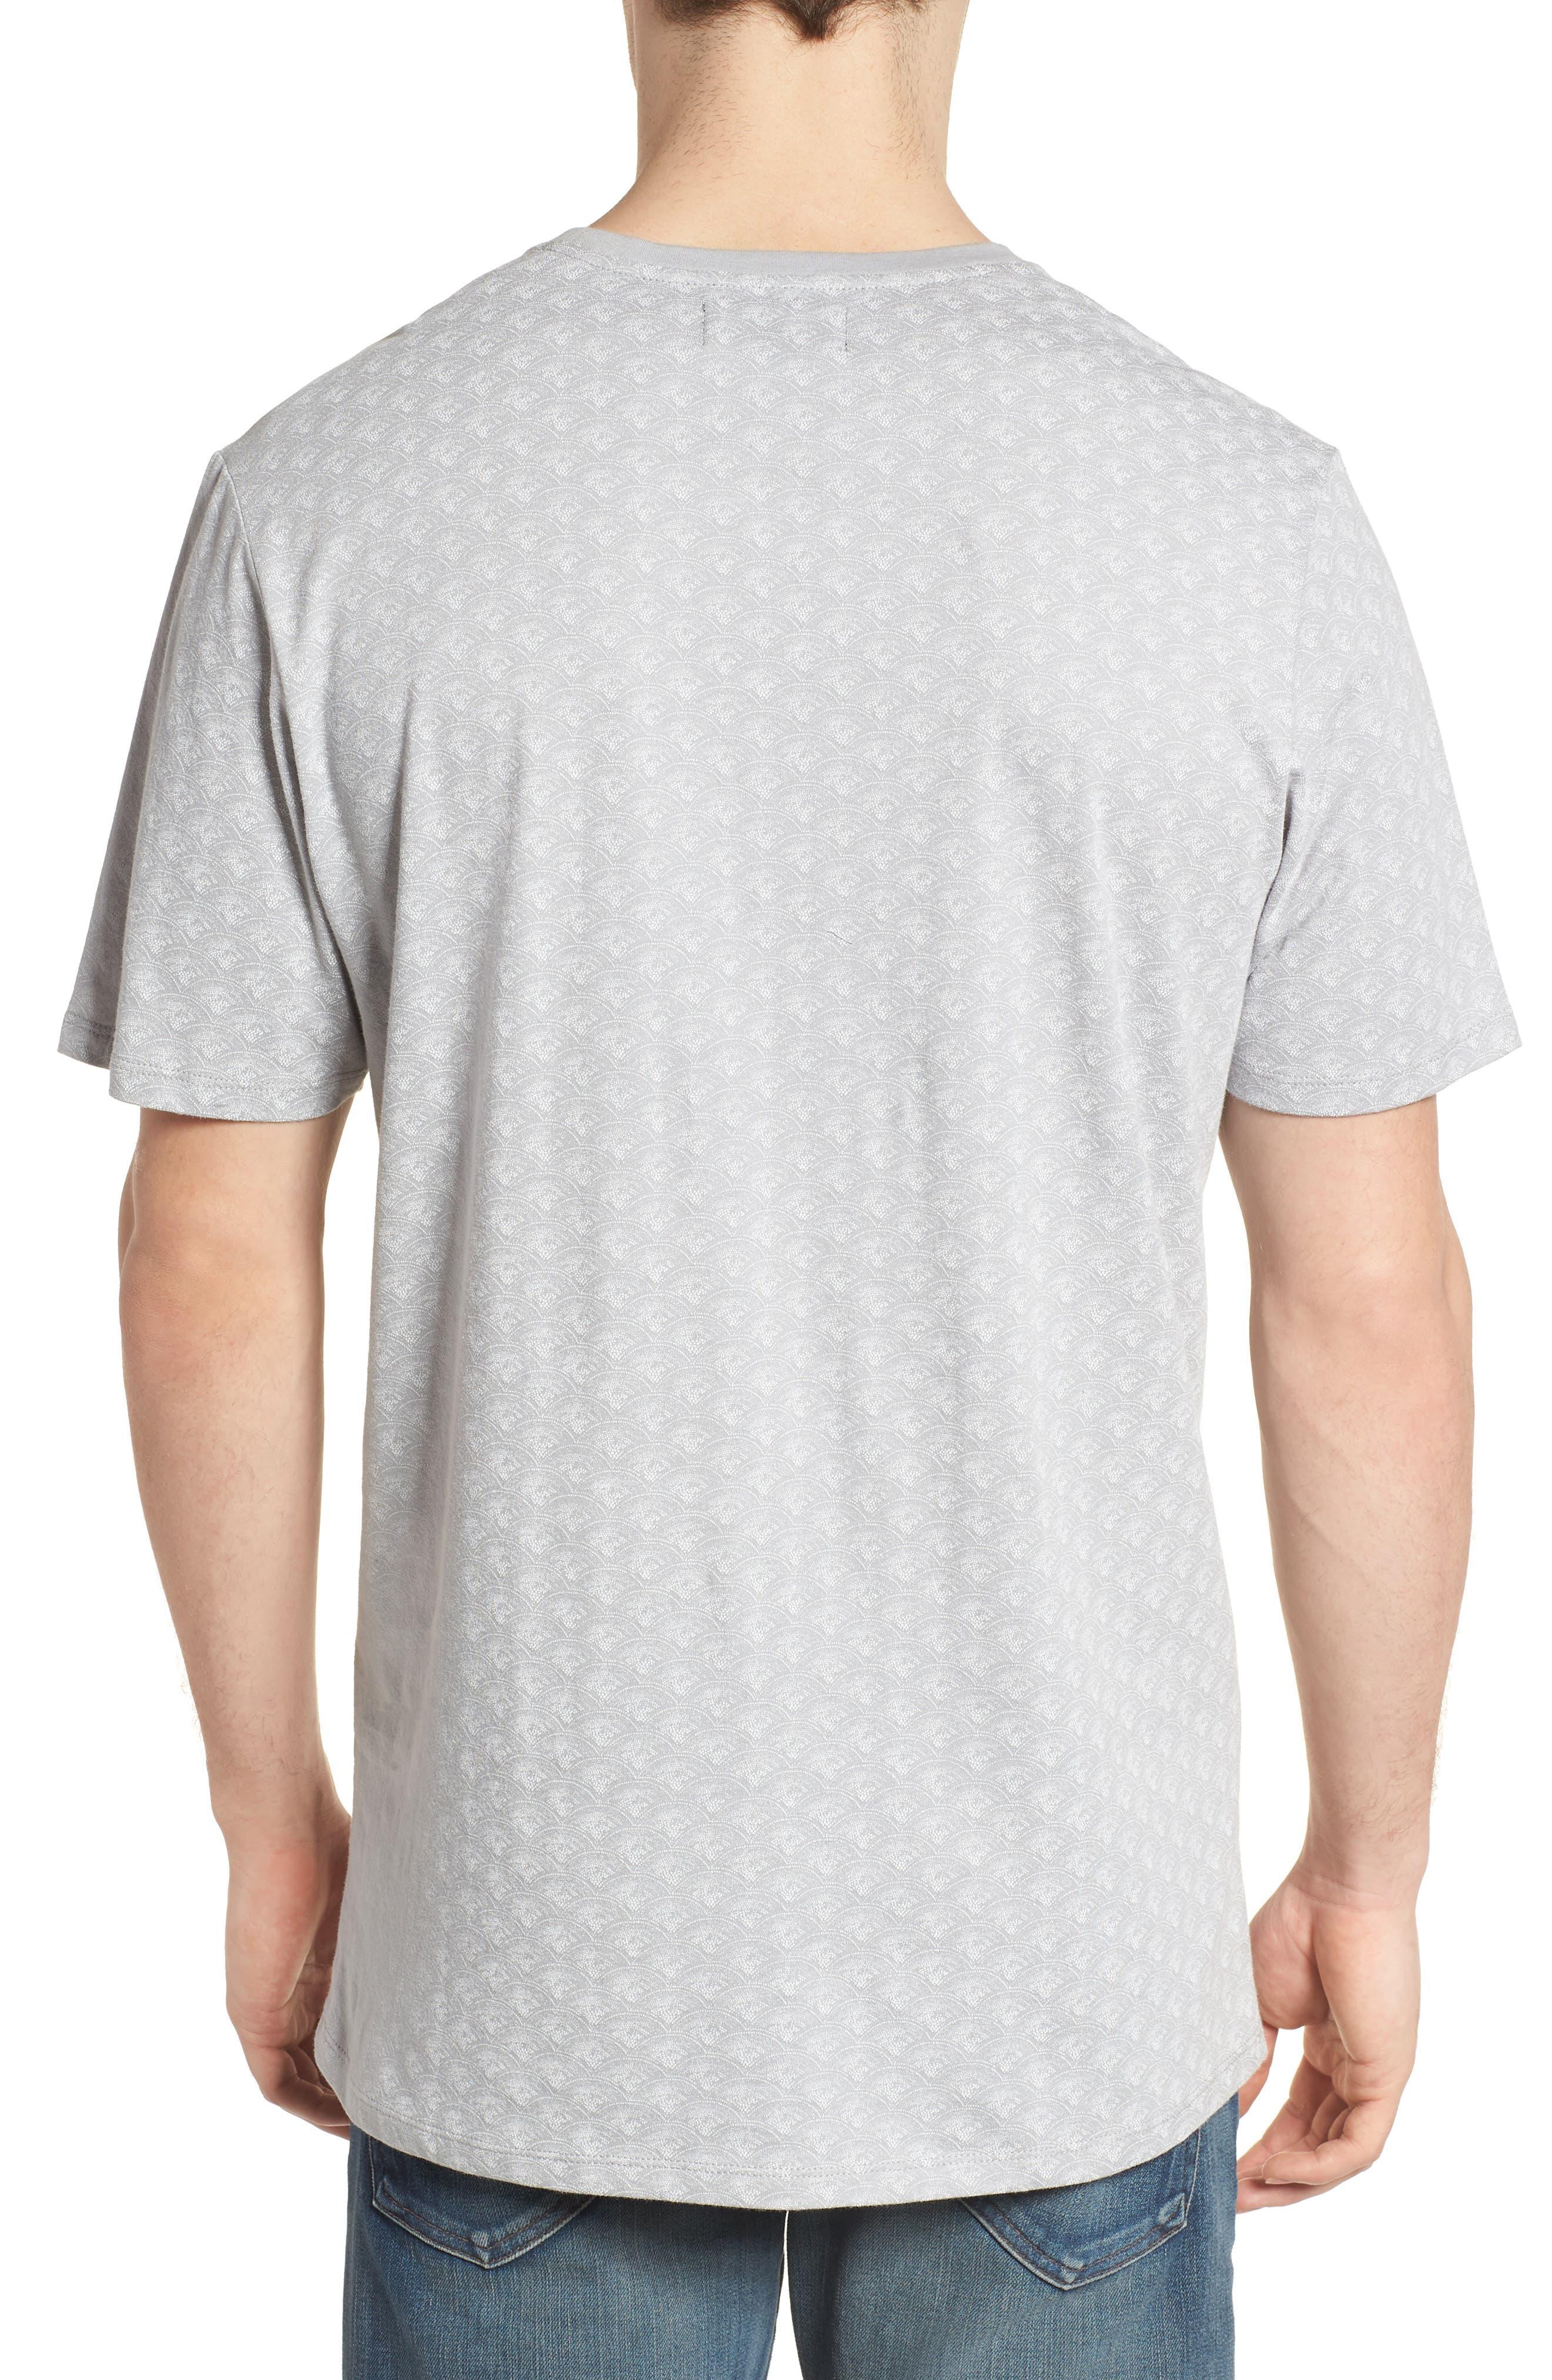 Pescado Short Sleeve T-Shirt,                             Alternate thumbnail 2, color,                             Sail